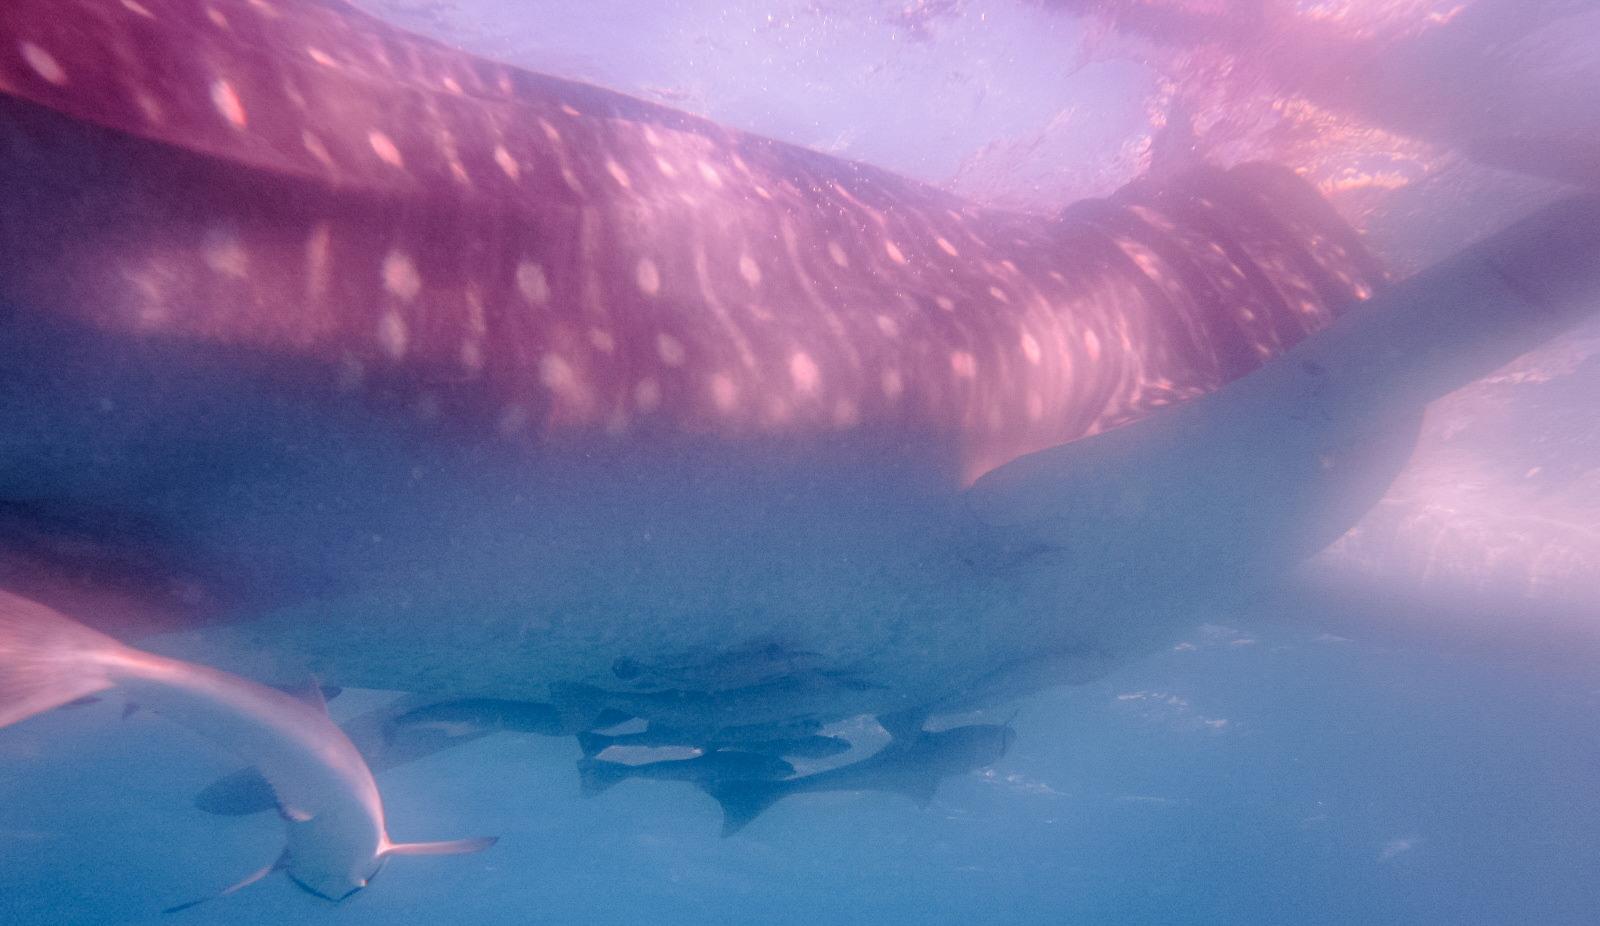 Китовая акула Whale shark (Rhincodon typus), о.Сумилон